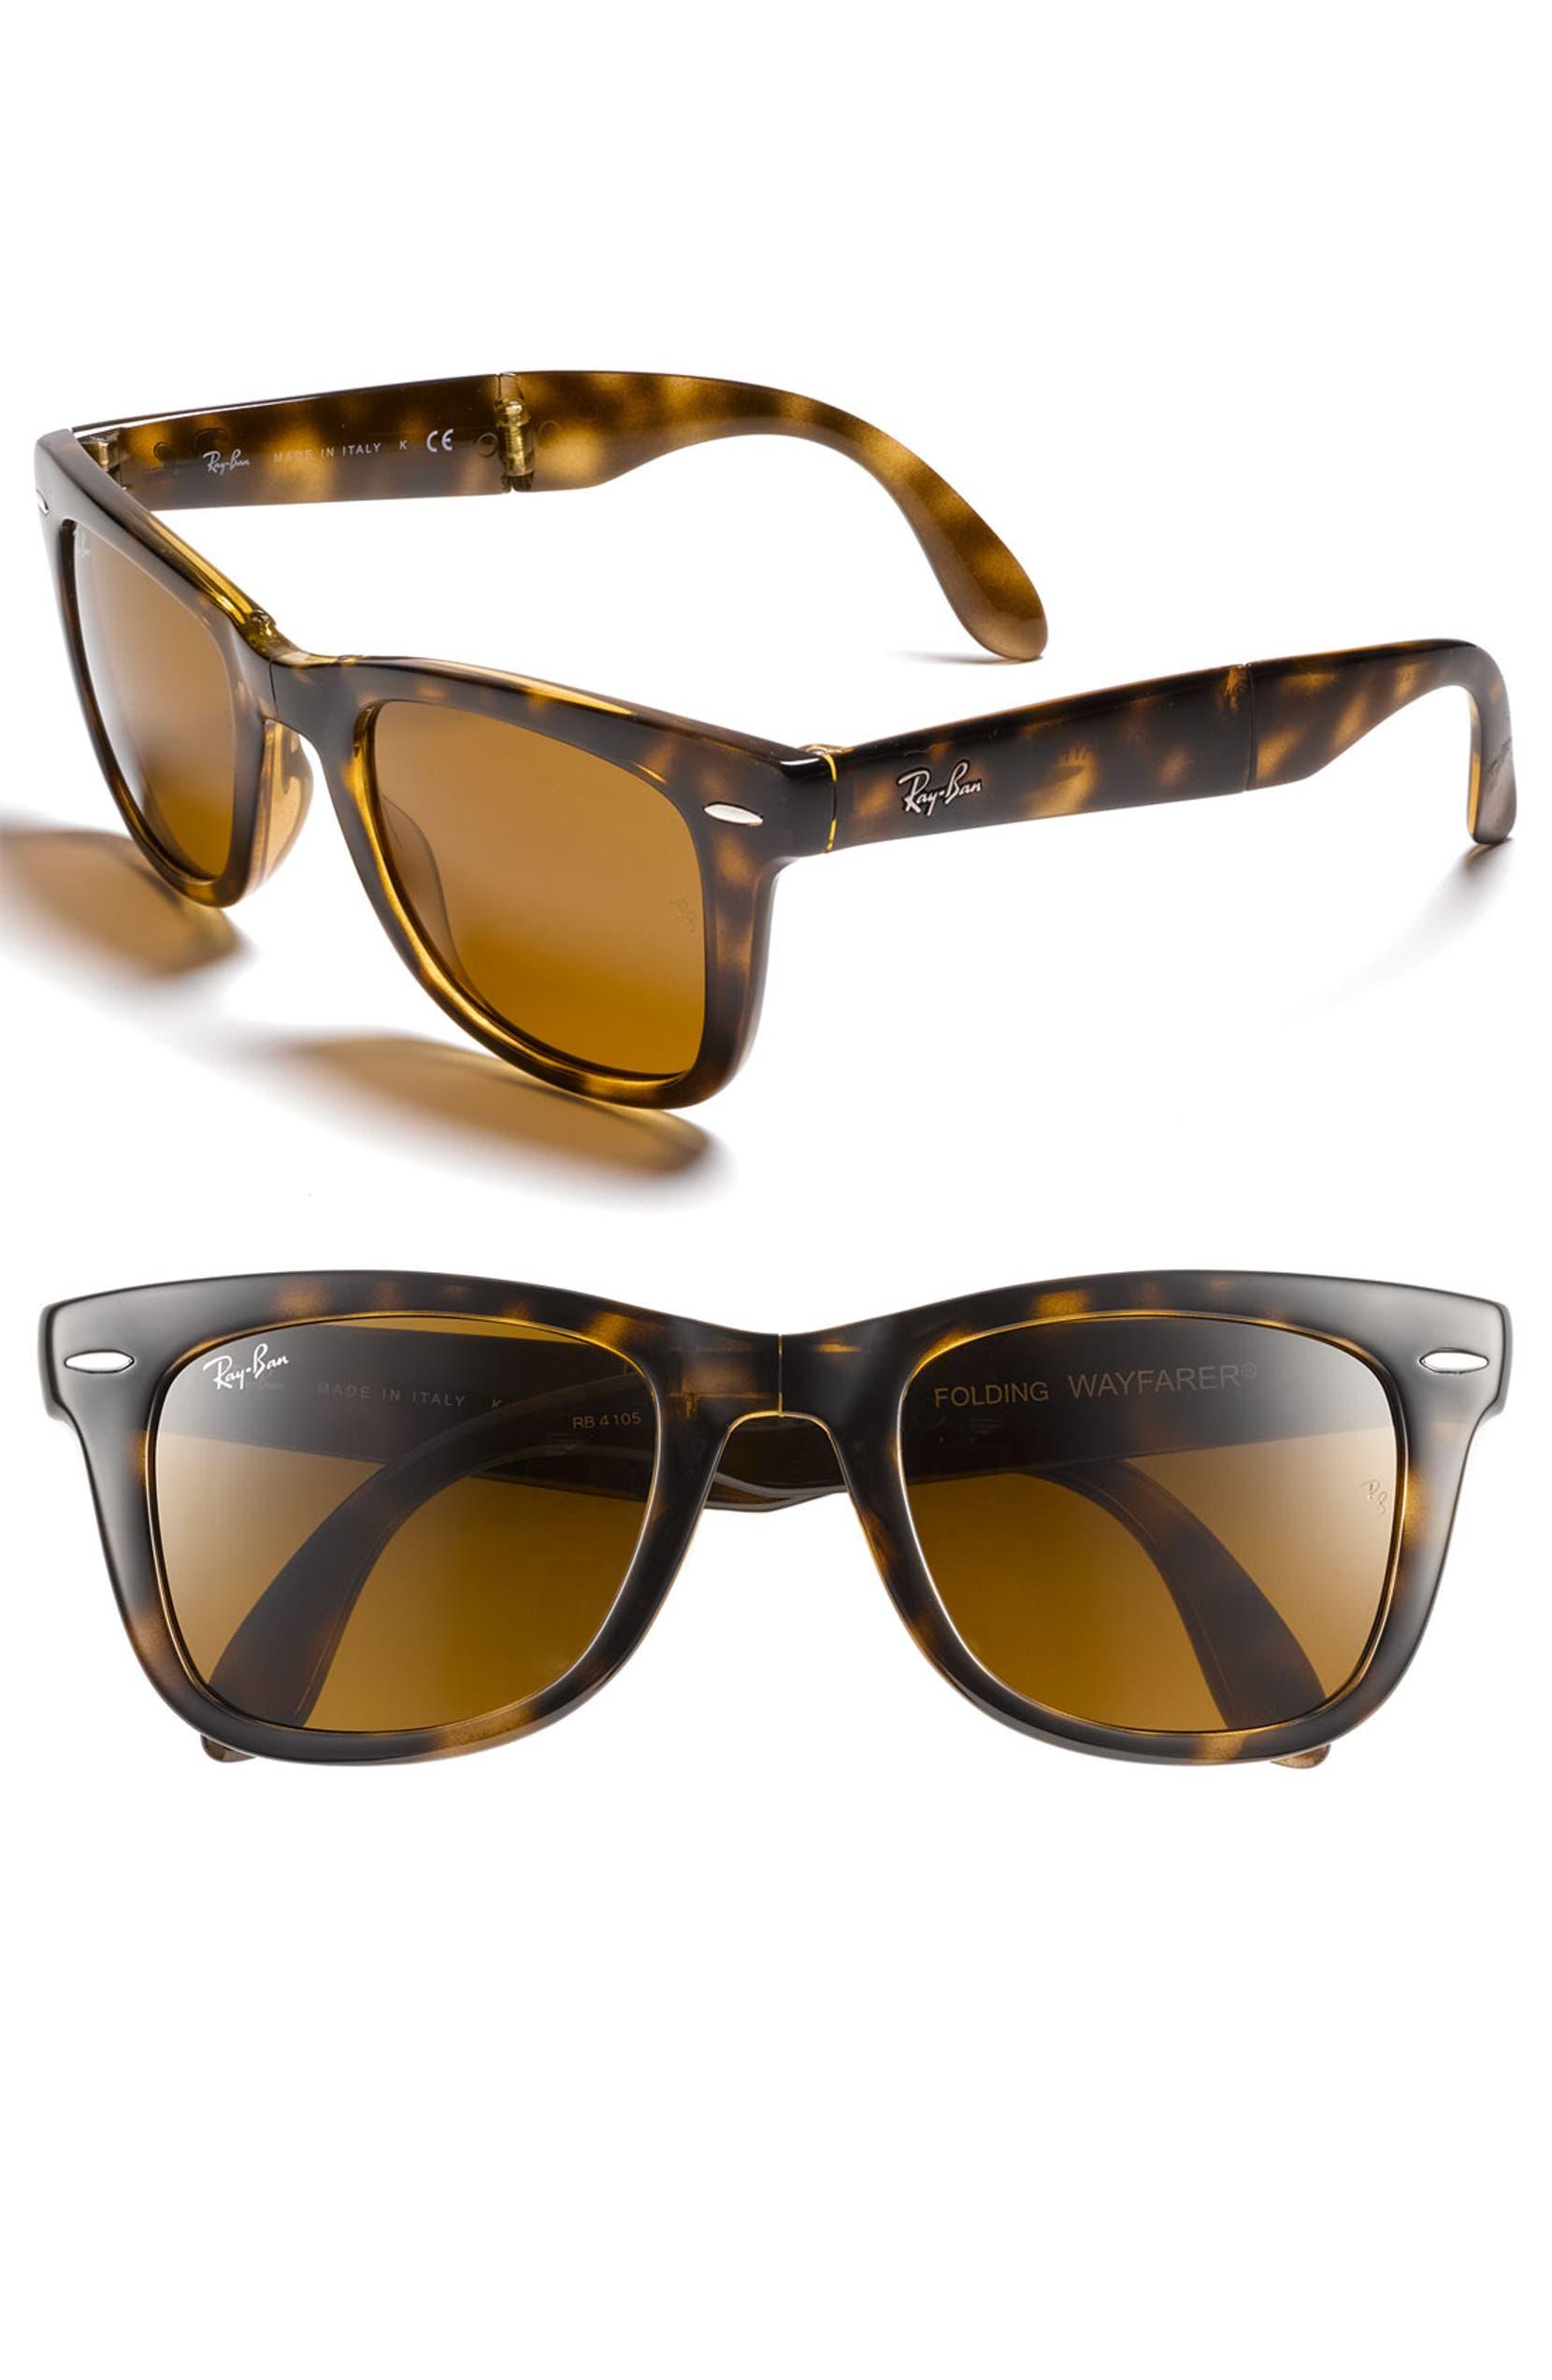 313e6e135 Ray-Ban Standard 50mm Folding Wayfarer Sunglasses | Nordstrom